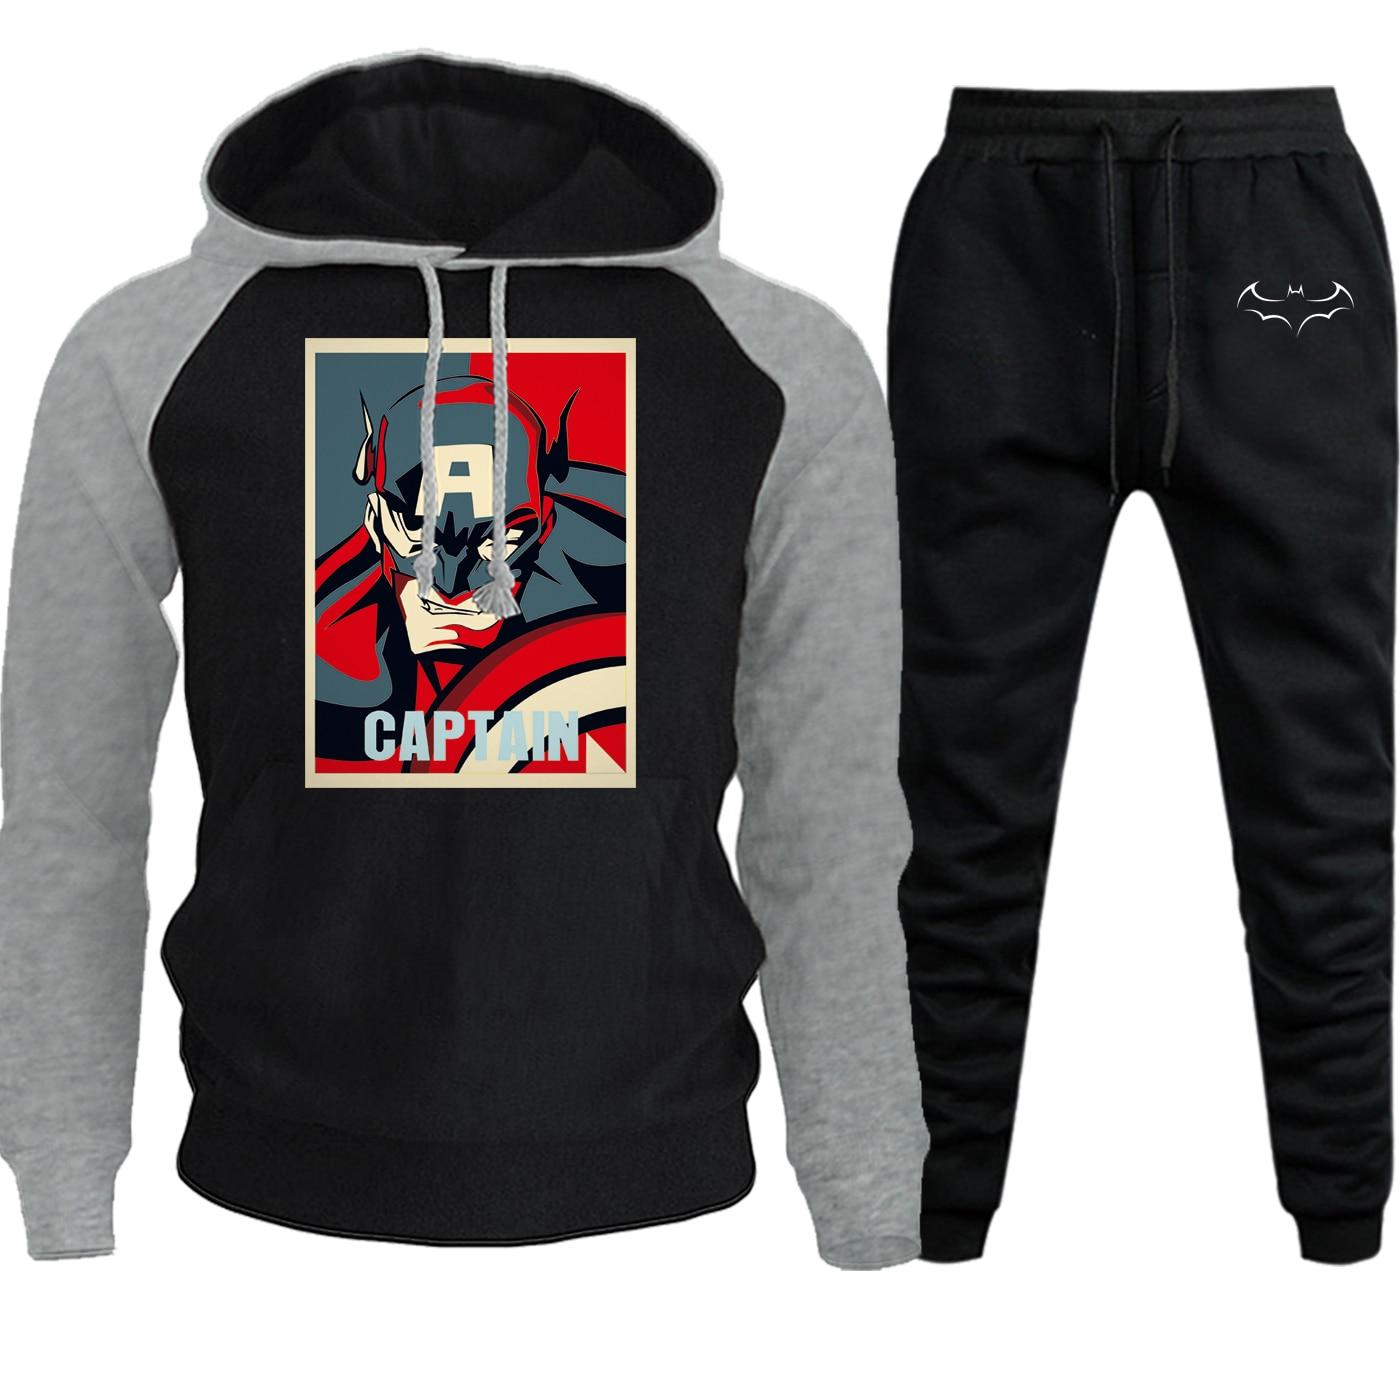 The Avengers Streetwear Mens Raglan Hoodies Marvel Hip Hop Casual Pullover 2019 Autumn Winter Suit Hooded+Pants 2 Piece Sets